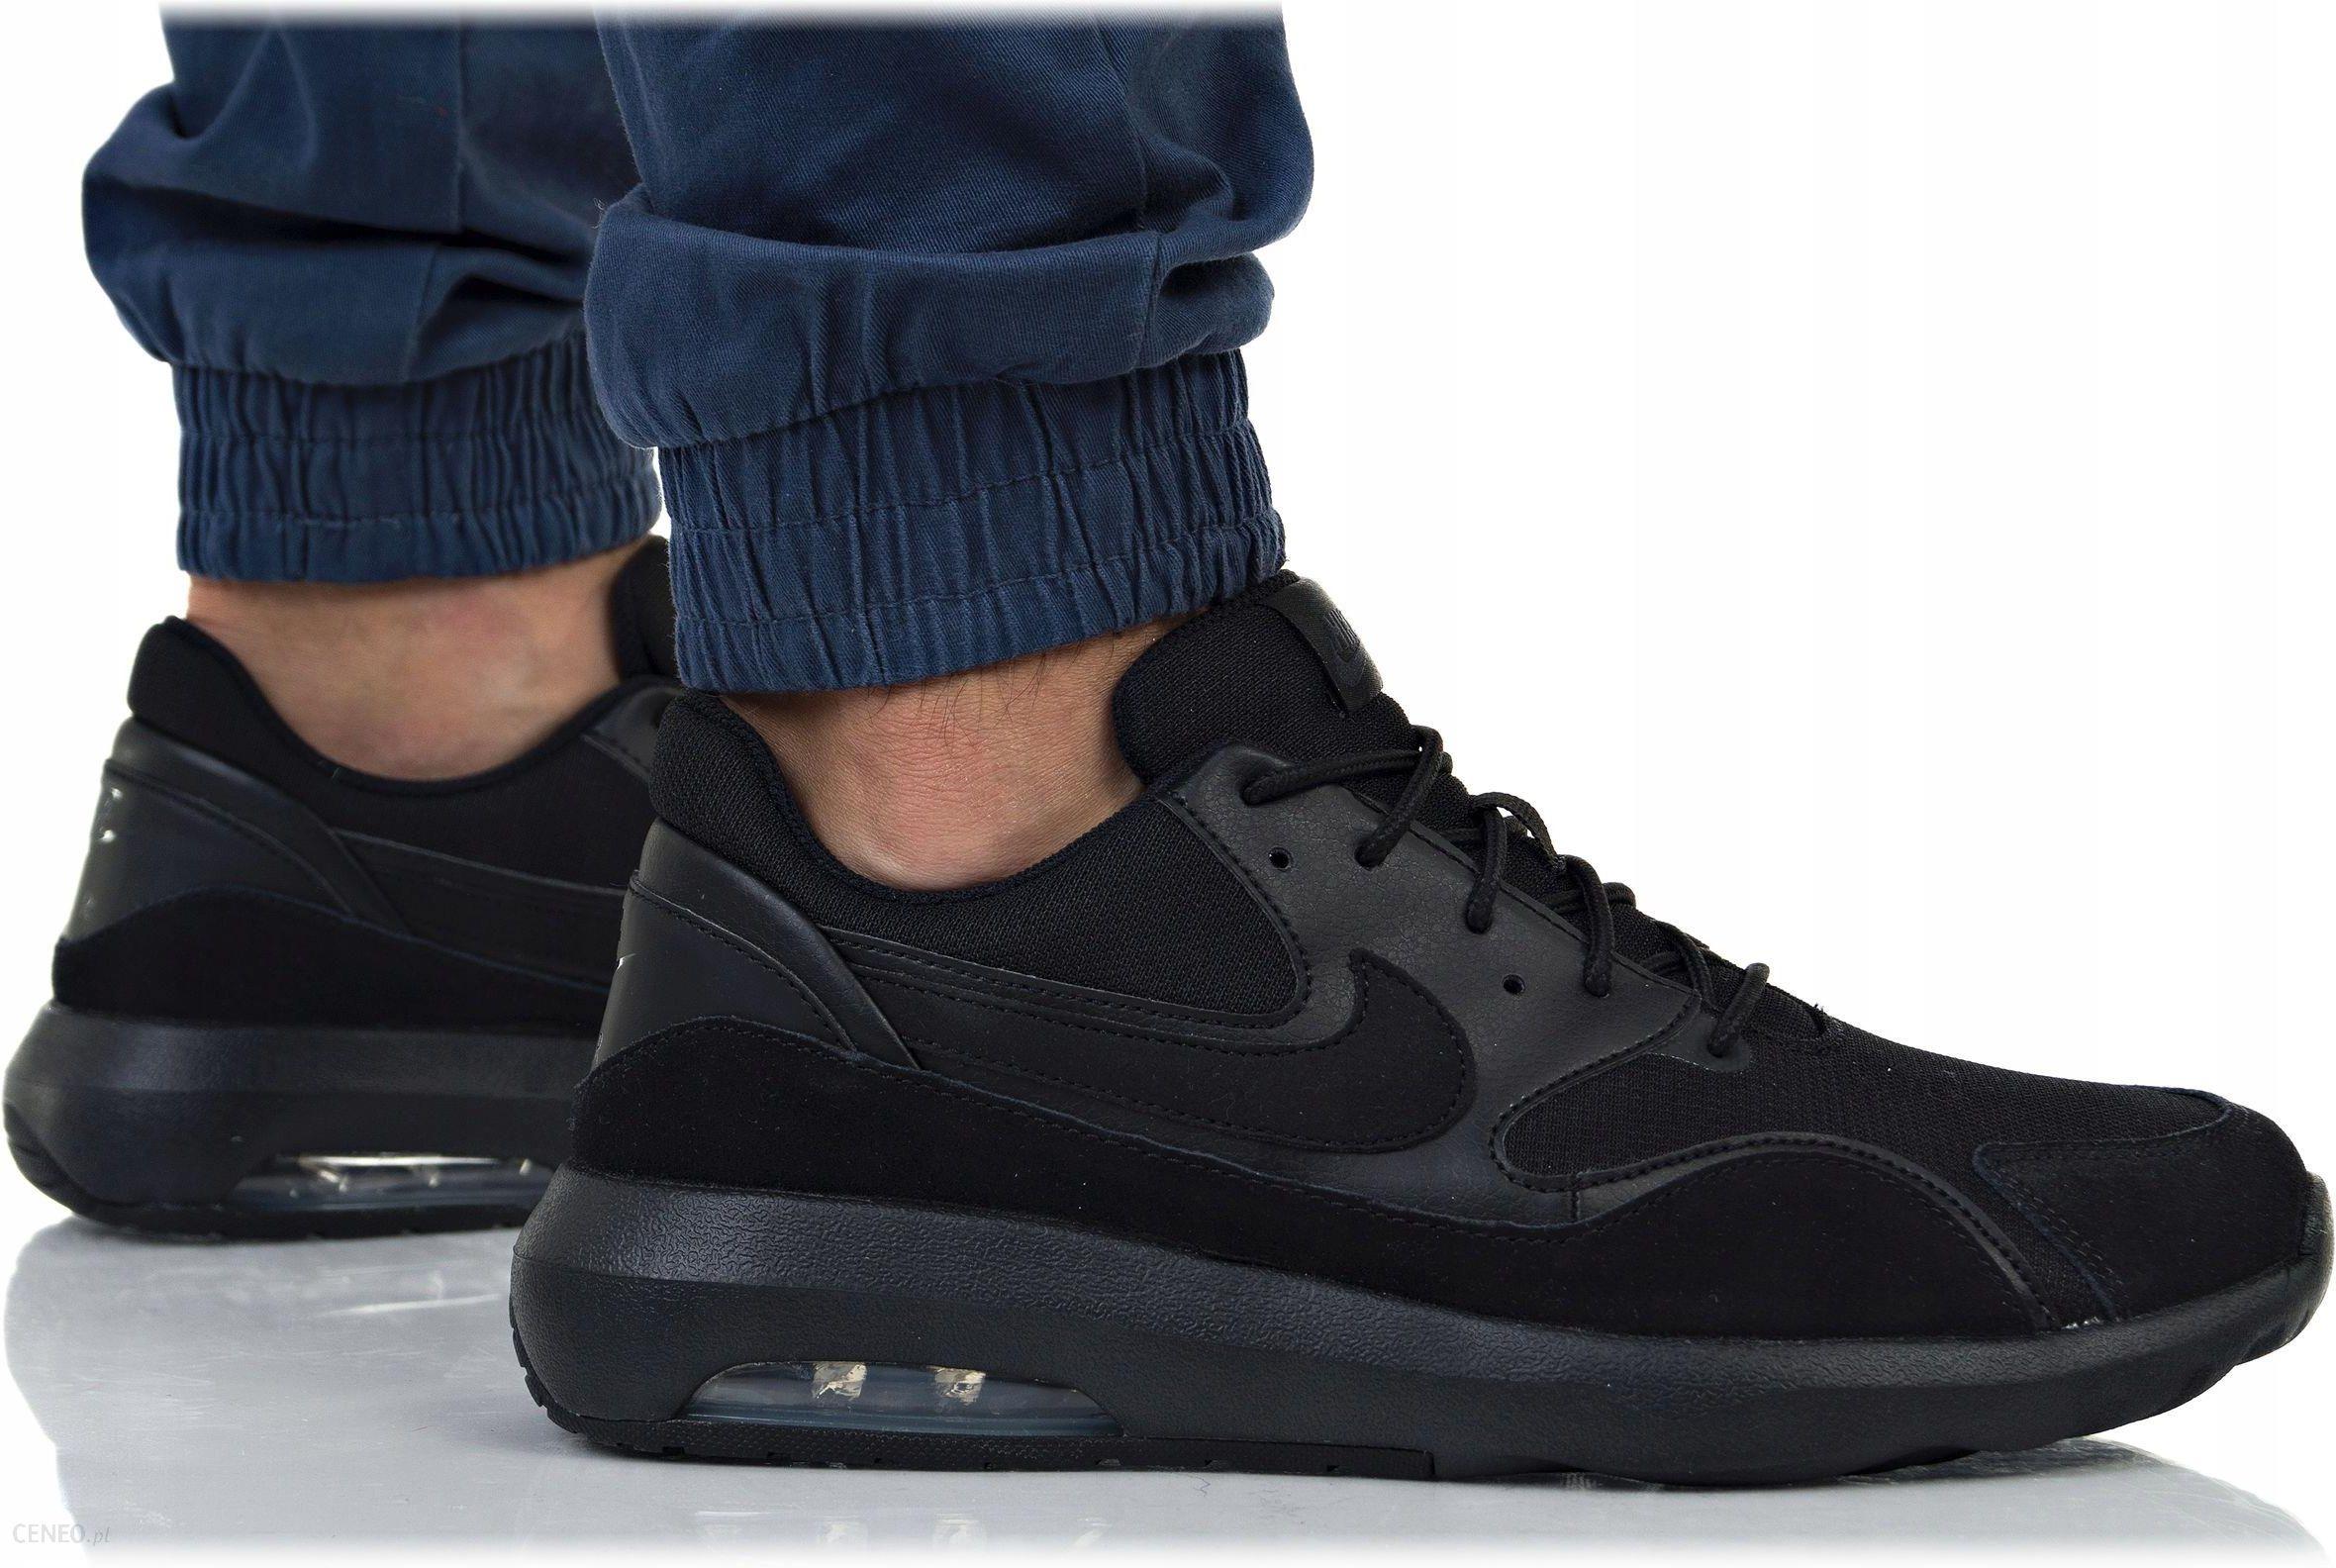 Buty Nike Air Max Nostalgic M 916781 006 czarne